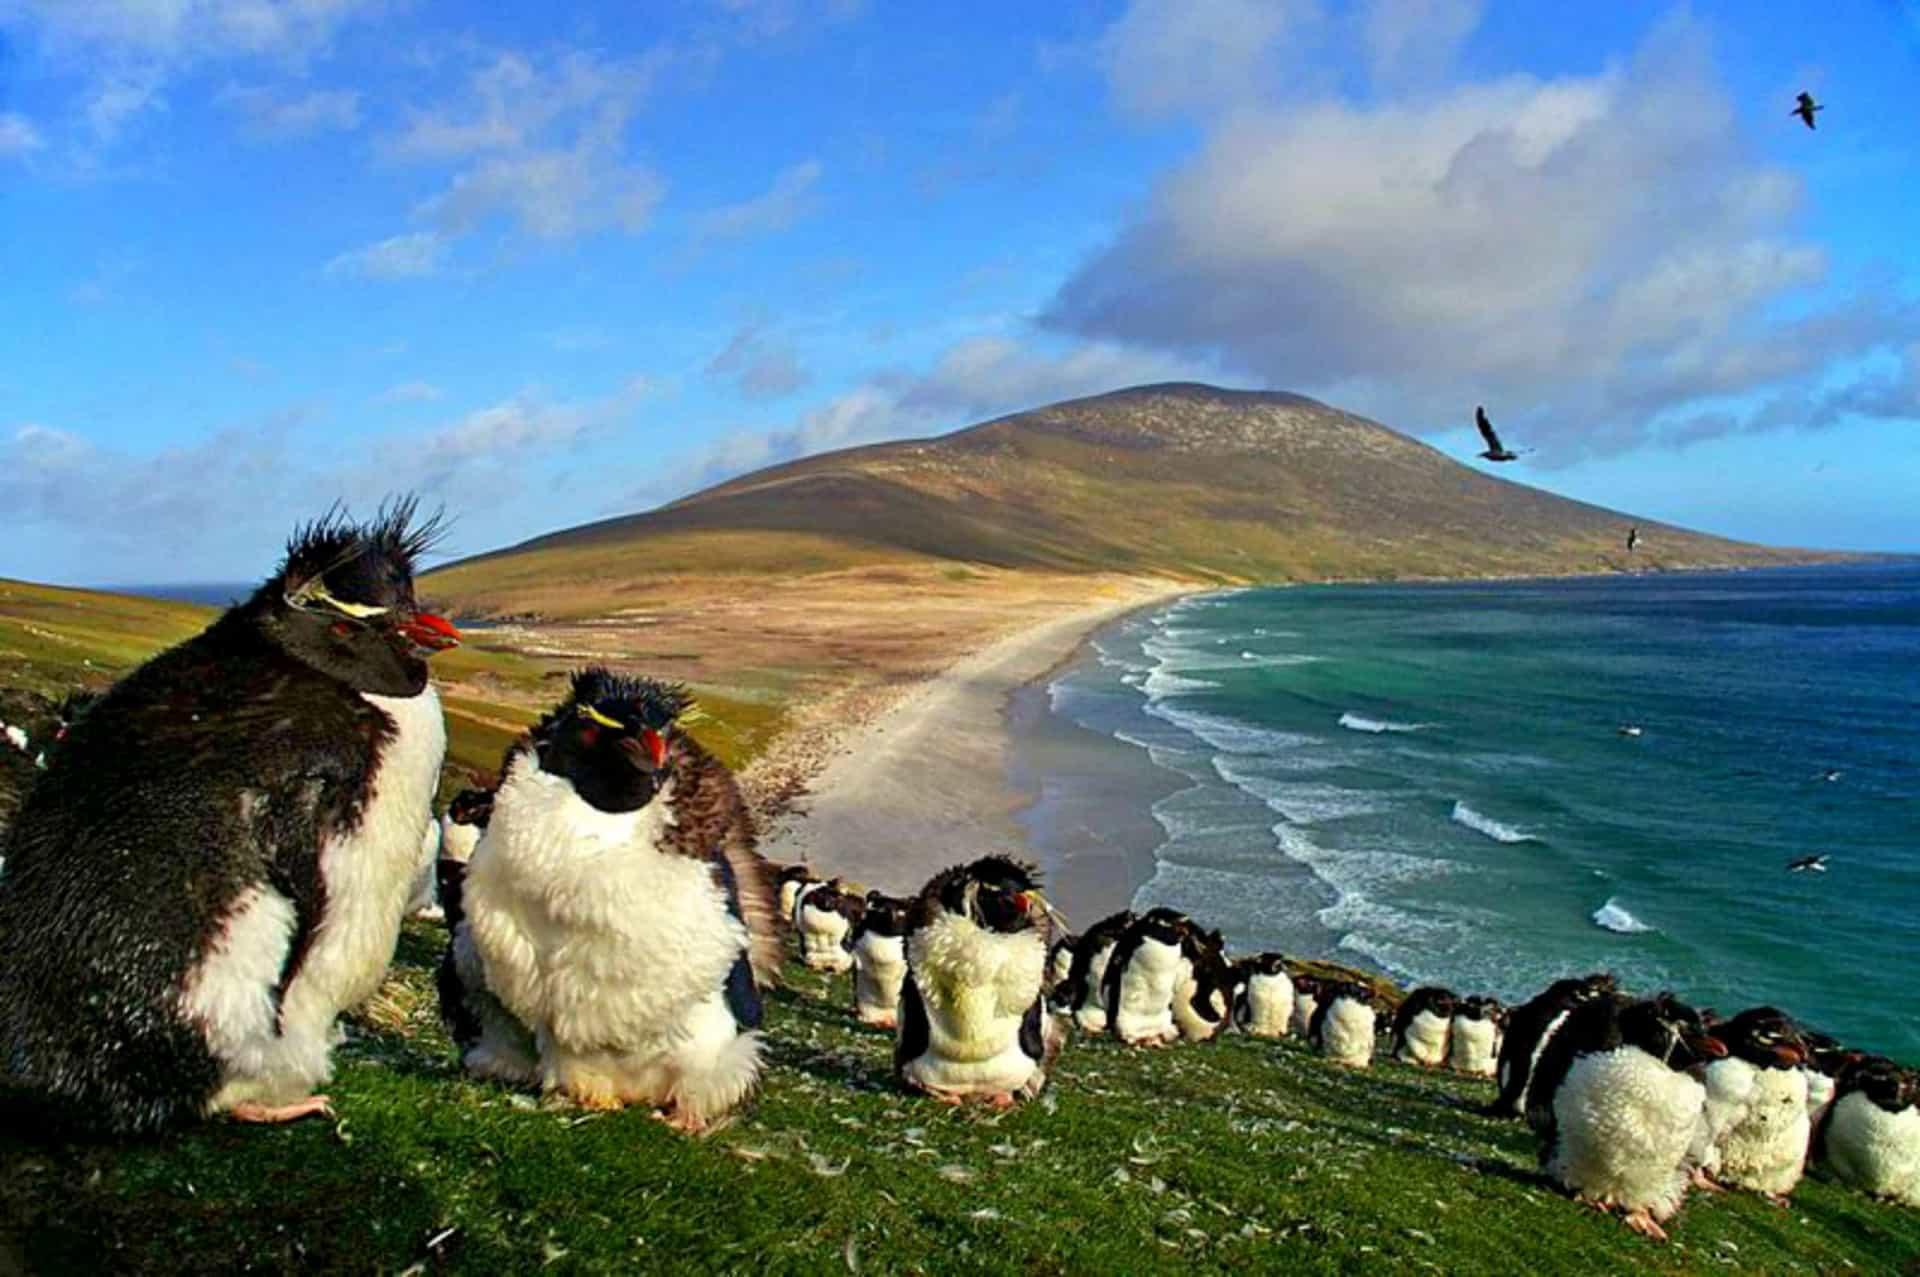 Тур с круизом на Celebrity Silhouette 5*: из Аргентины в Антарктиду - Туристический оператор APL Travel (АПЛ Тревел)